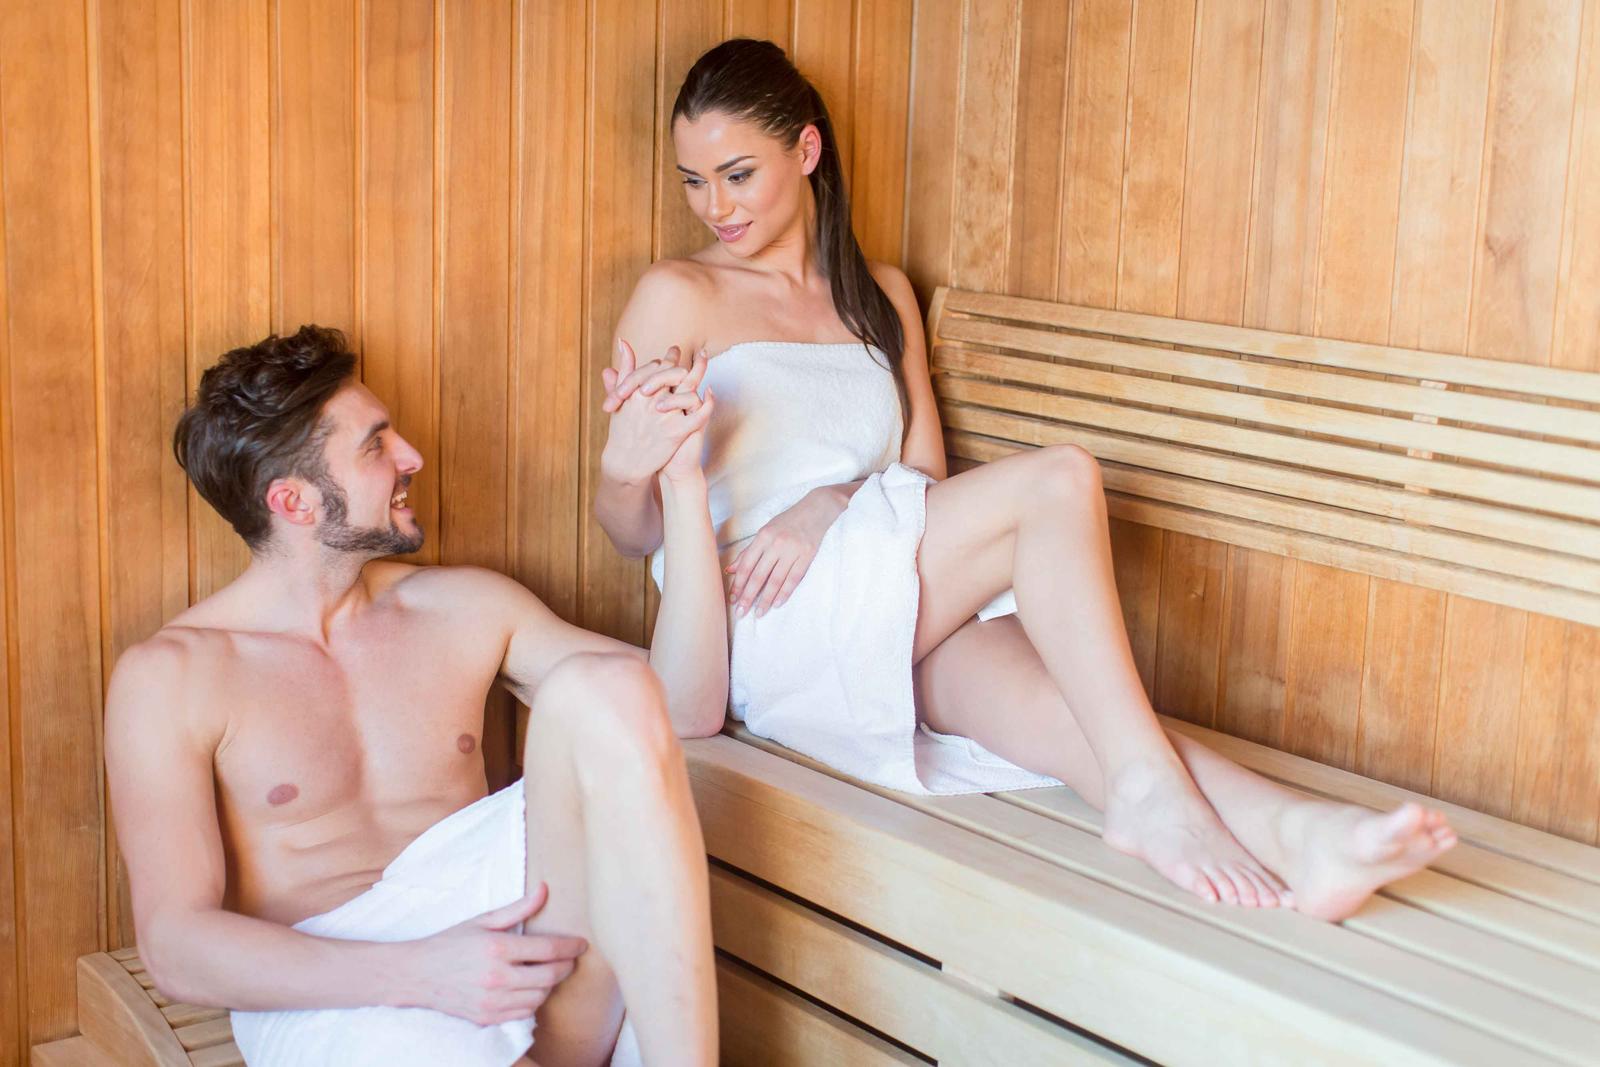 sauna de infrarrojos wellma de Astralpool